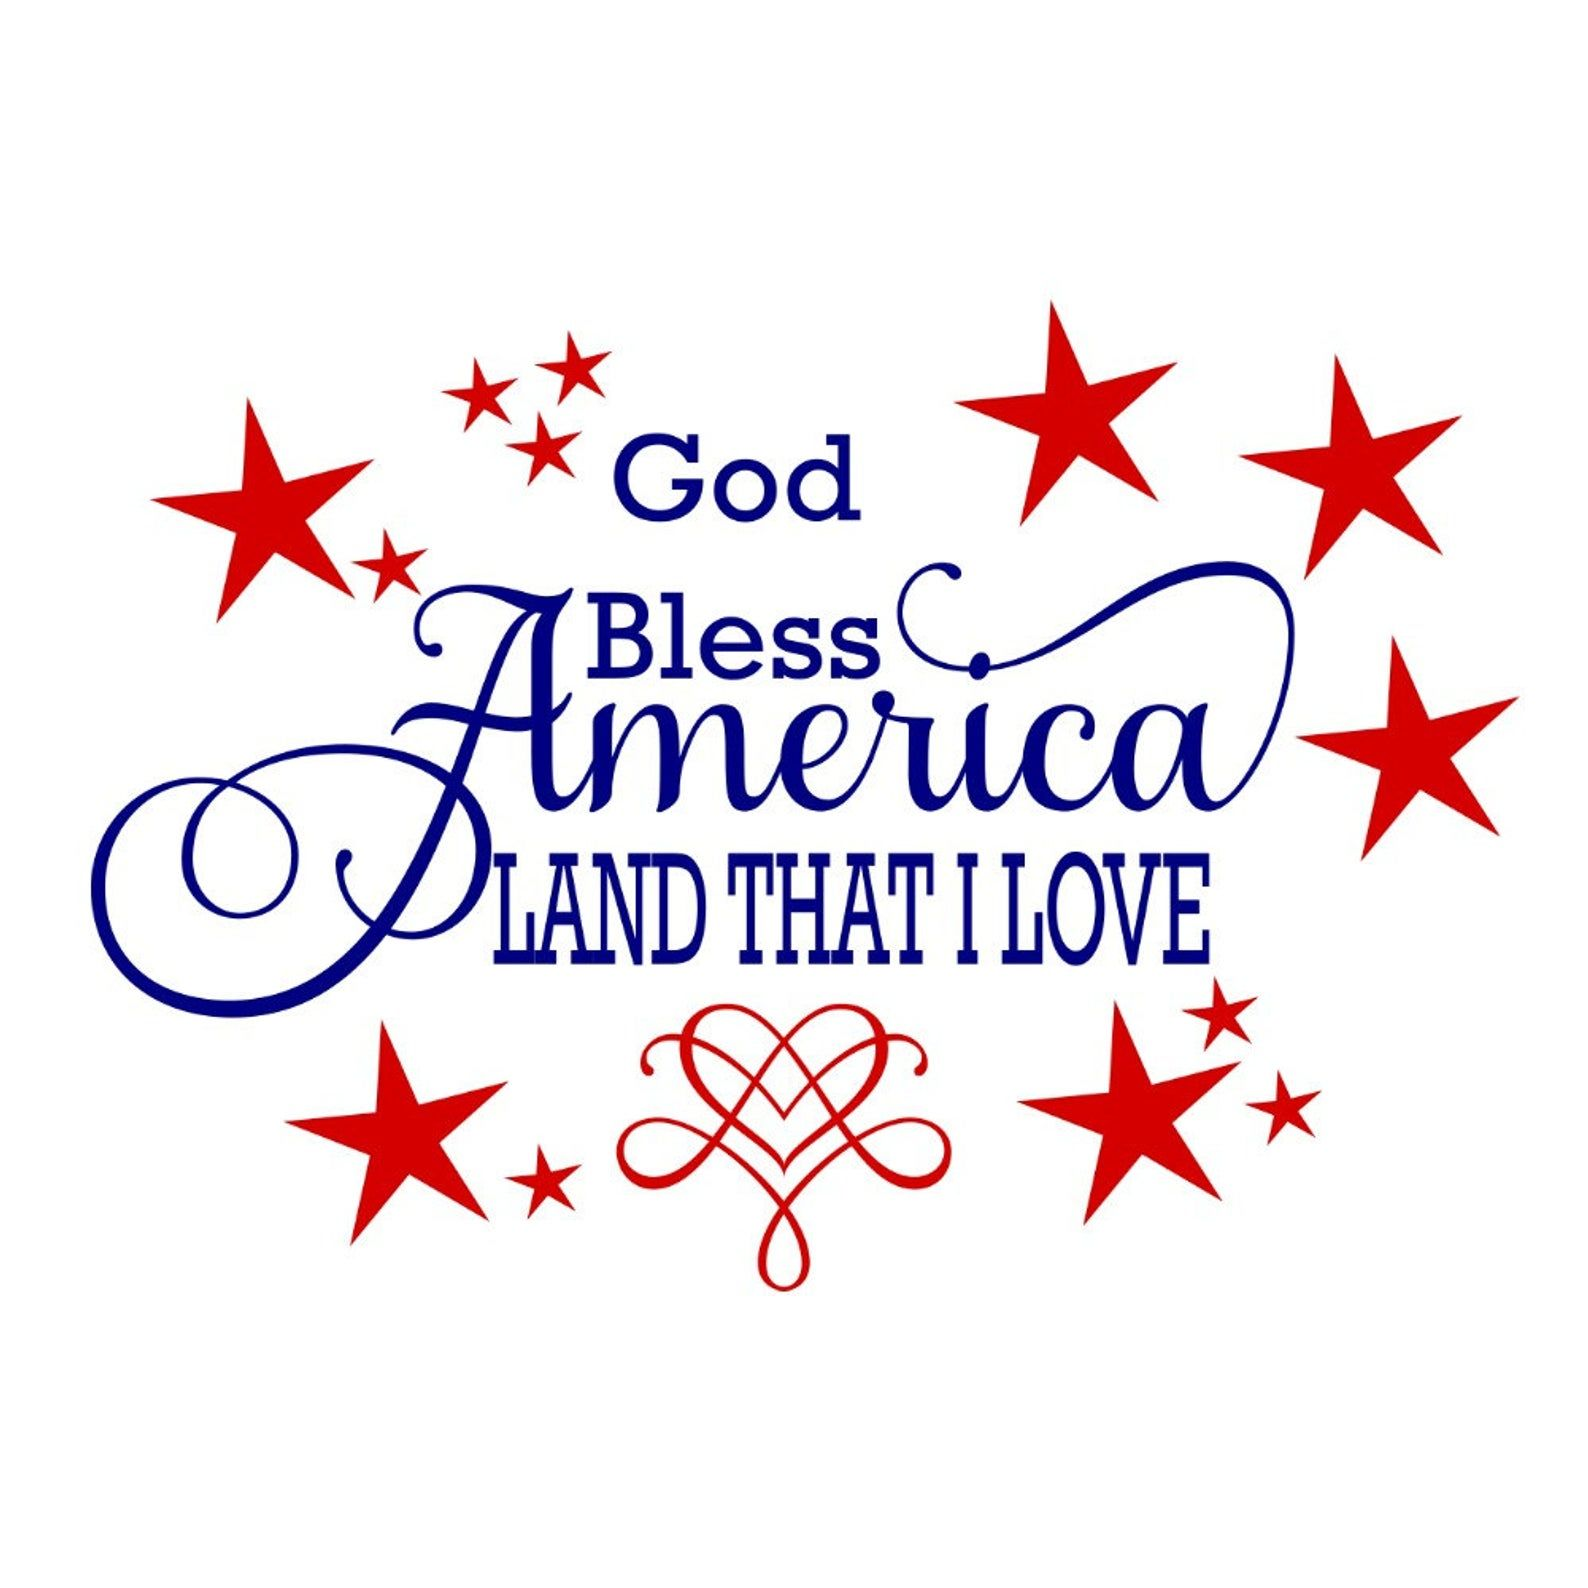 Download God Bless America Land That I Love svg God Bless America ...